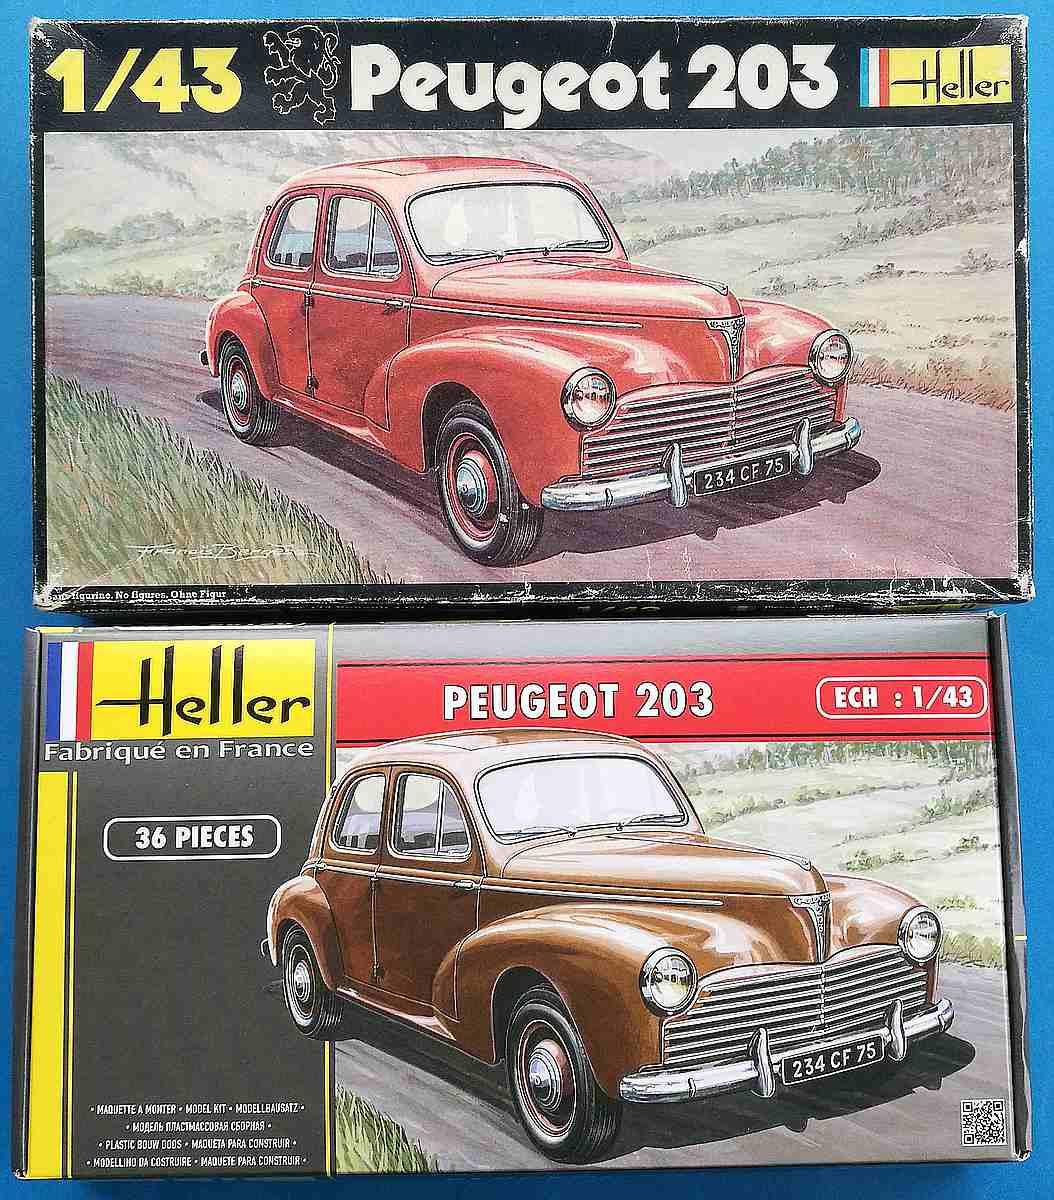 Heller-160-Peugeot-203-1zu43-2 Kit-Archäologie: Peugeot 203 in 1:43 von Heller #160